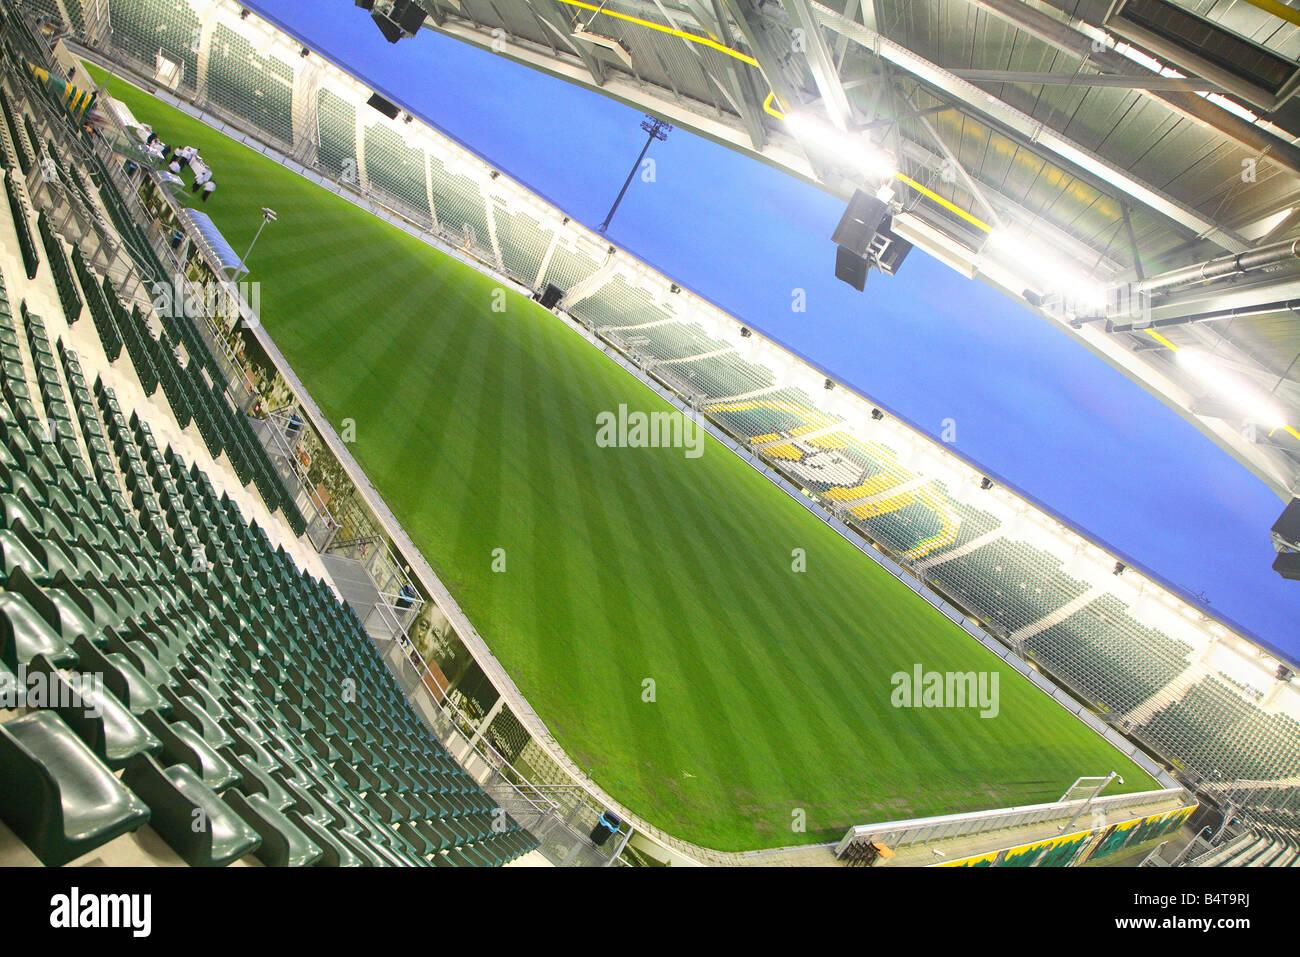 Ado Den Haag Stadion The Hague Stadium Holland Netherlands Stock Photo Alamy